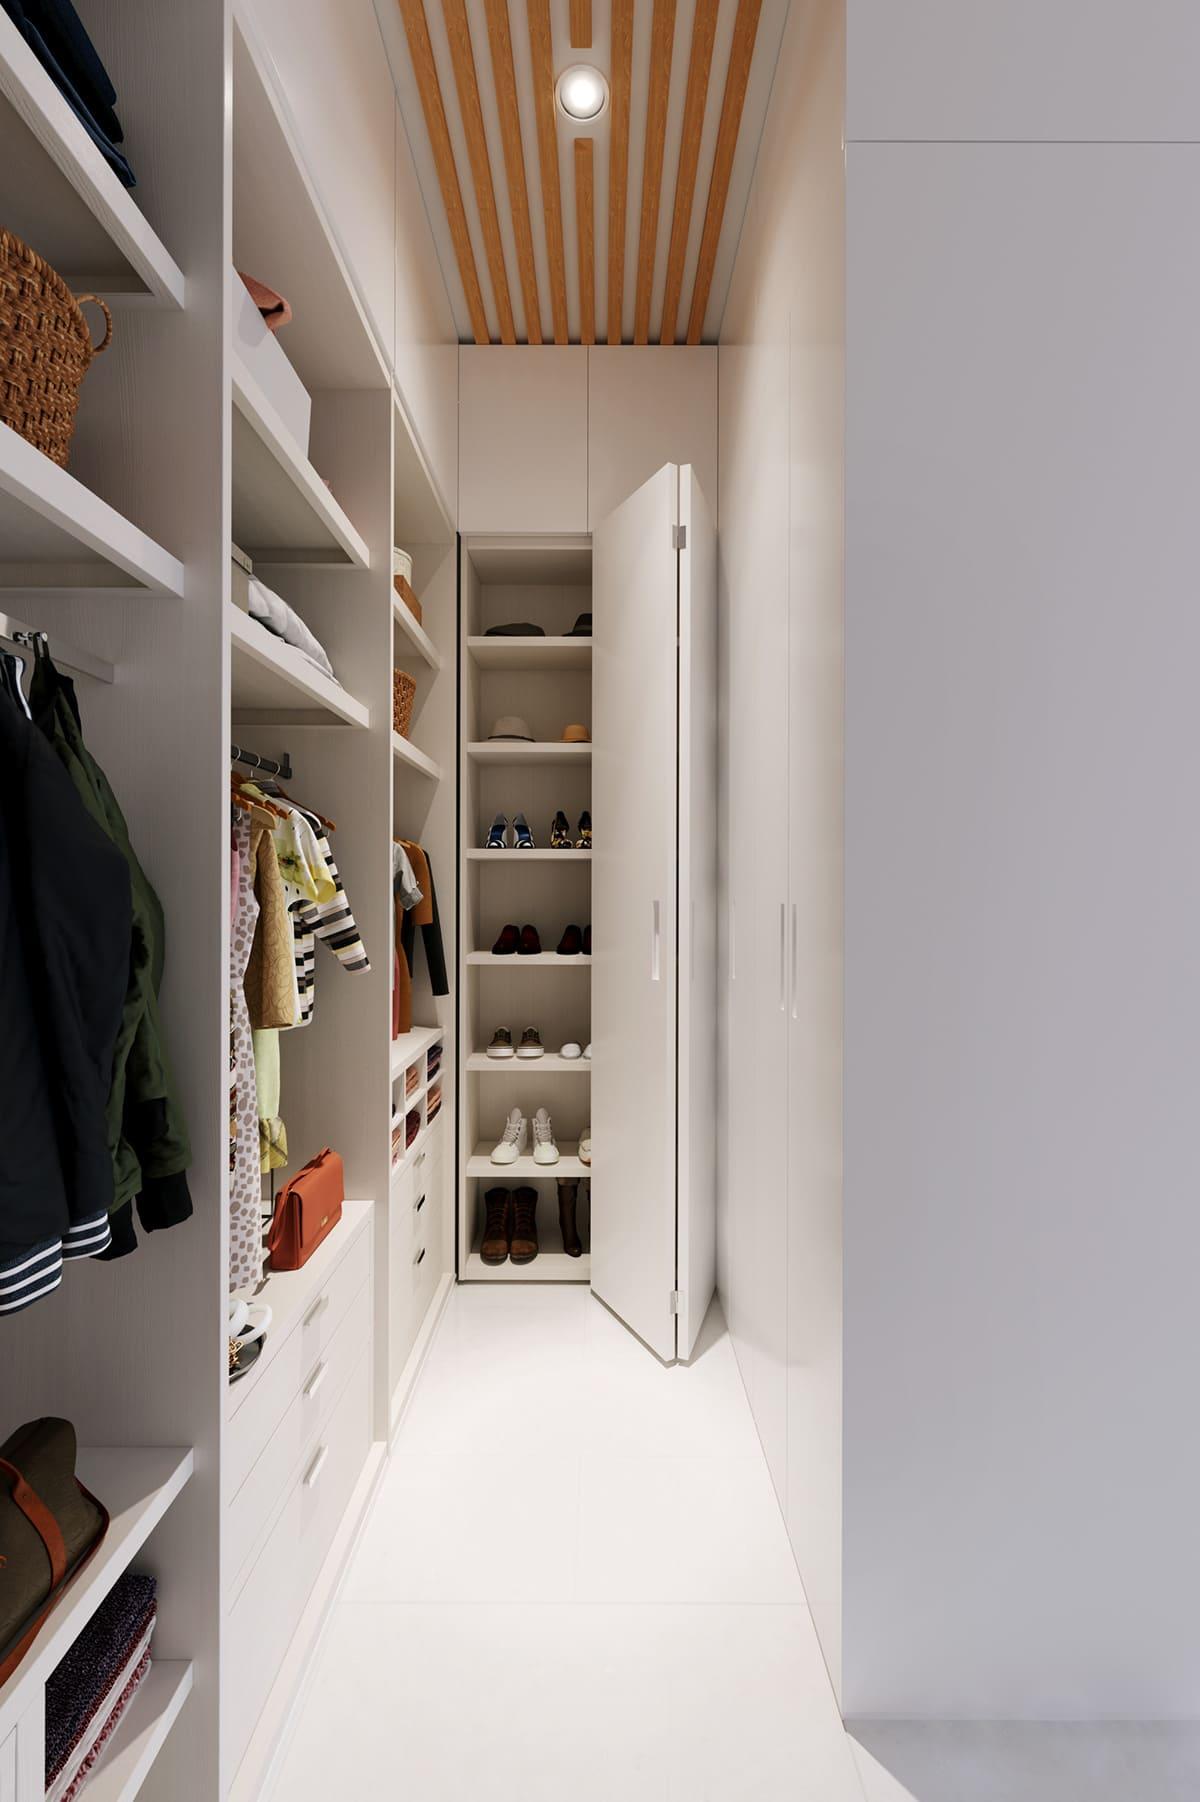 дизайн интерьера модной квартиры фото 14